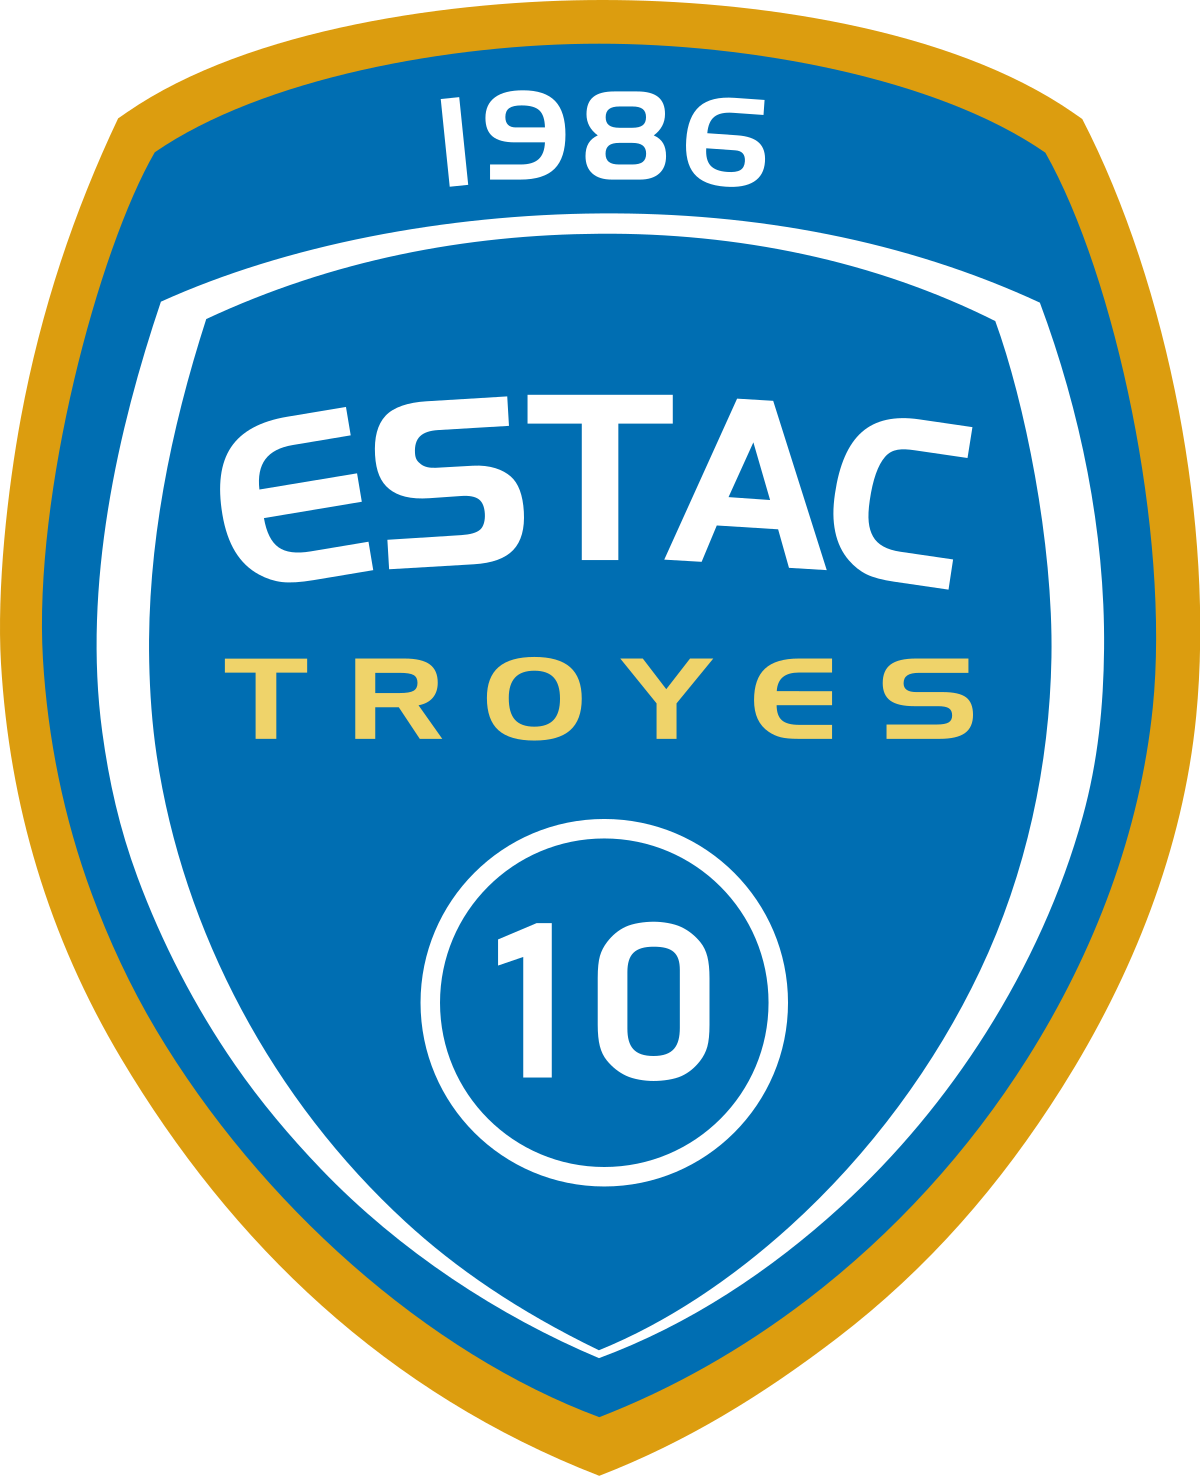 Troyes U-19 logo